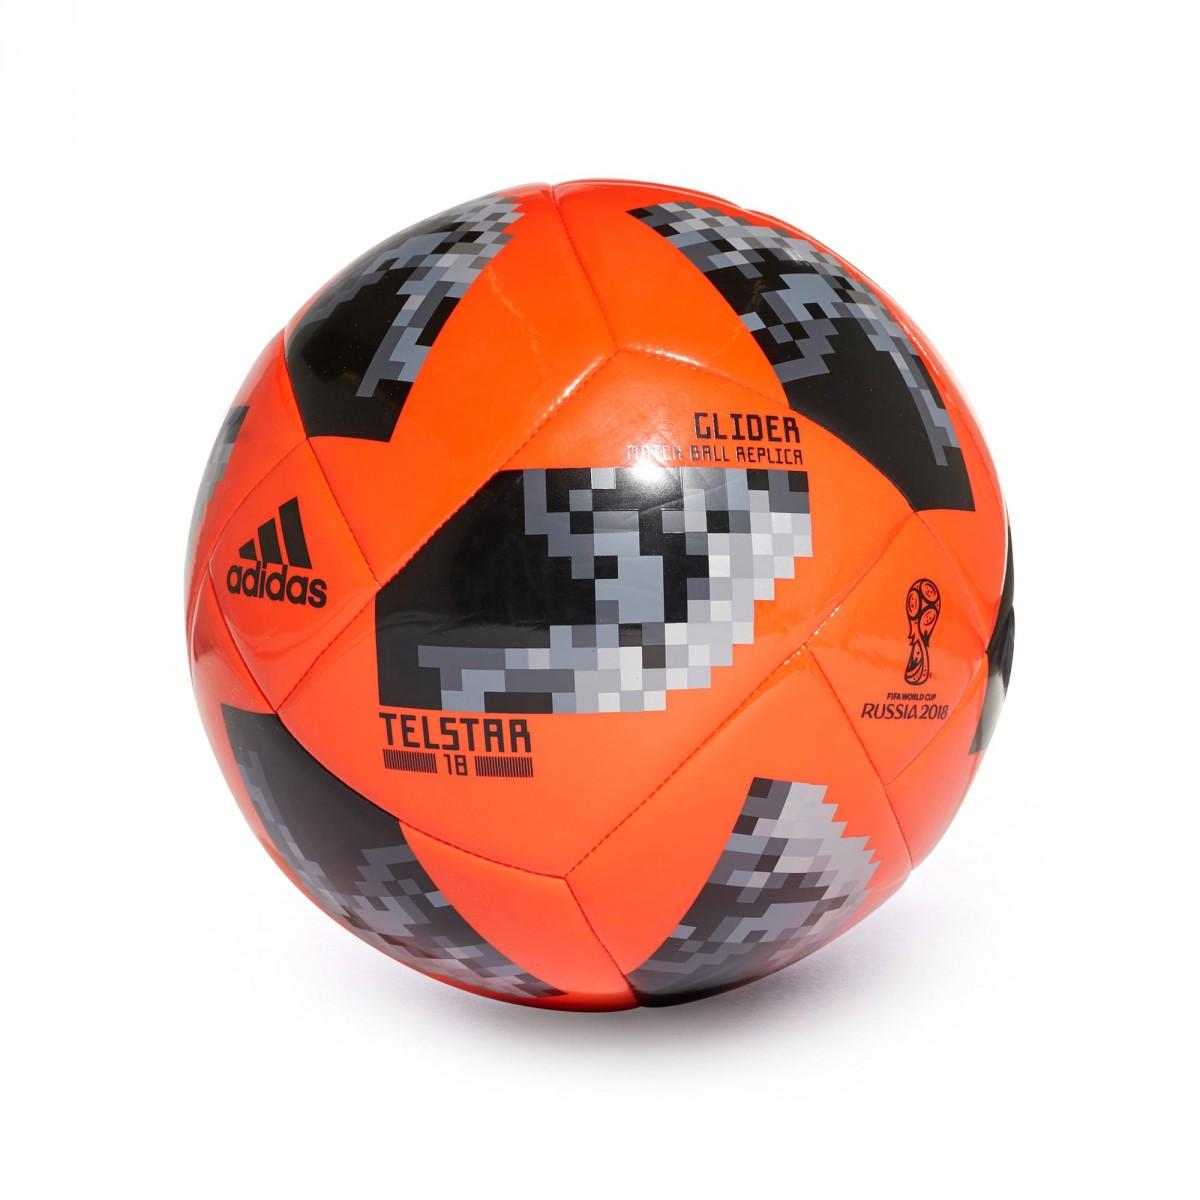 ... Balón World Cup Glider Telstar Solar red-Black-Silver metallic.  CATEGORY. Football Accessories 896ed2a748195